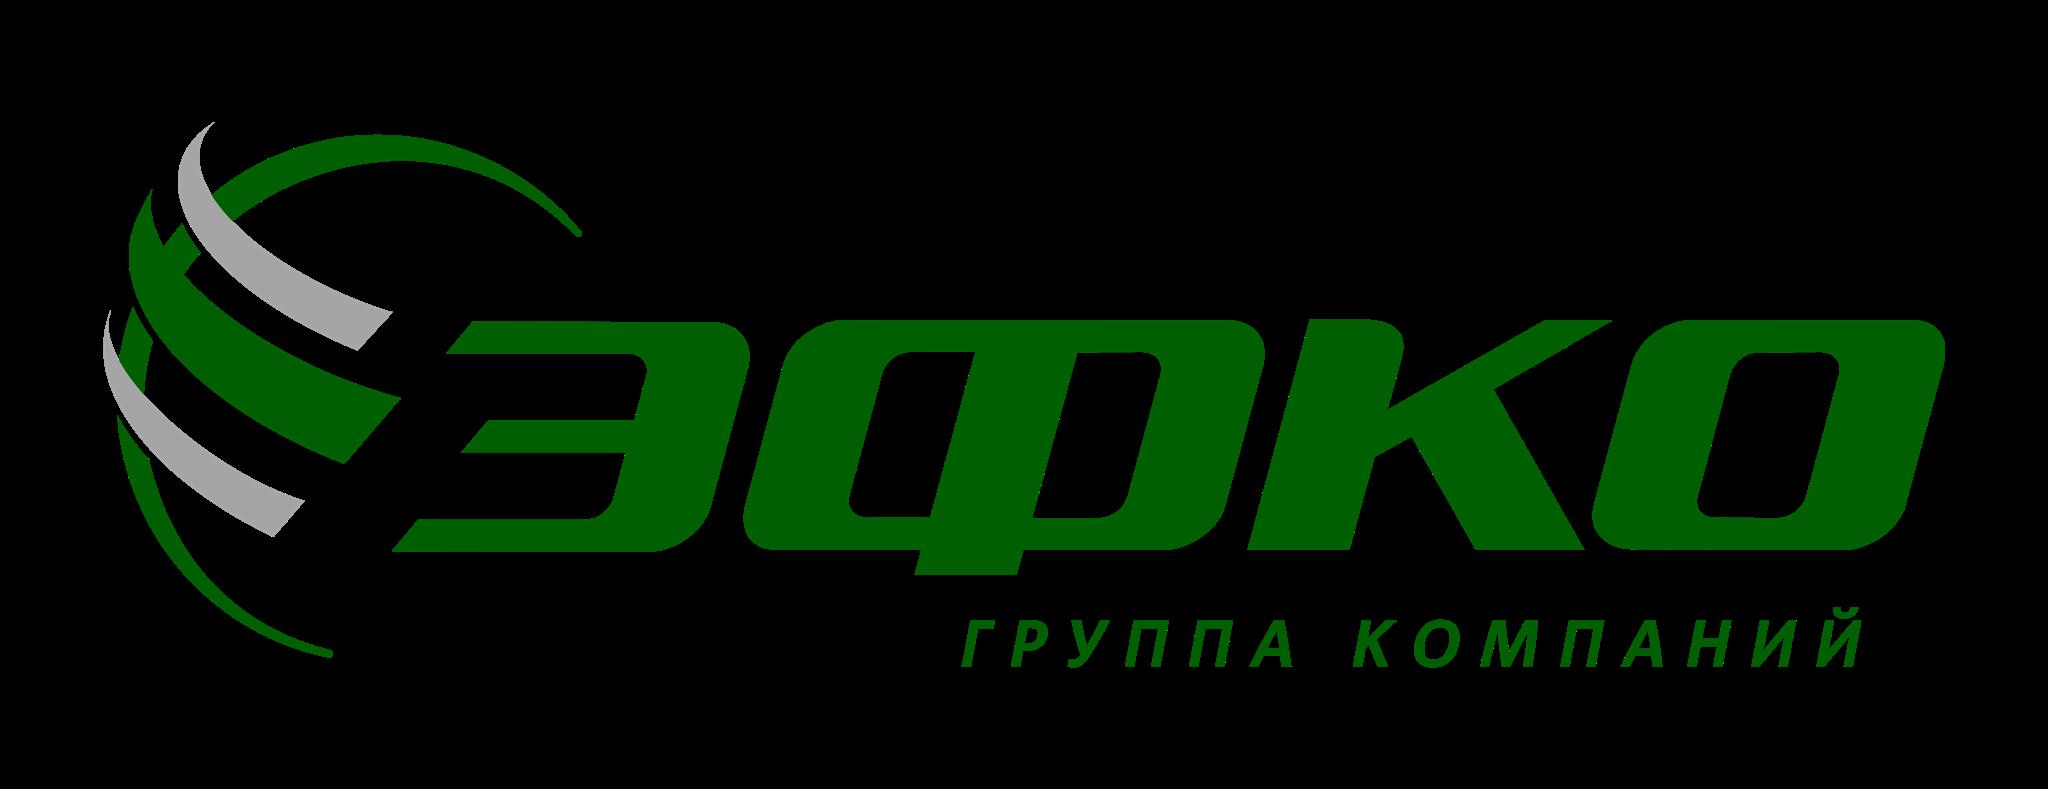 Группа компаний «ЭФКО»